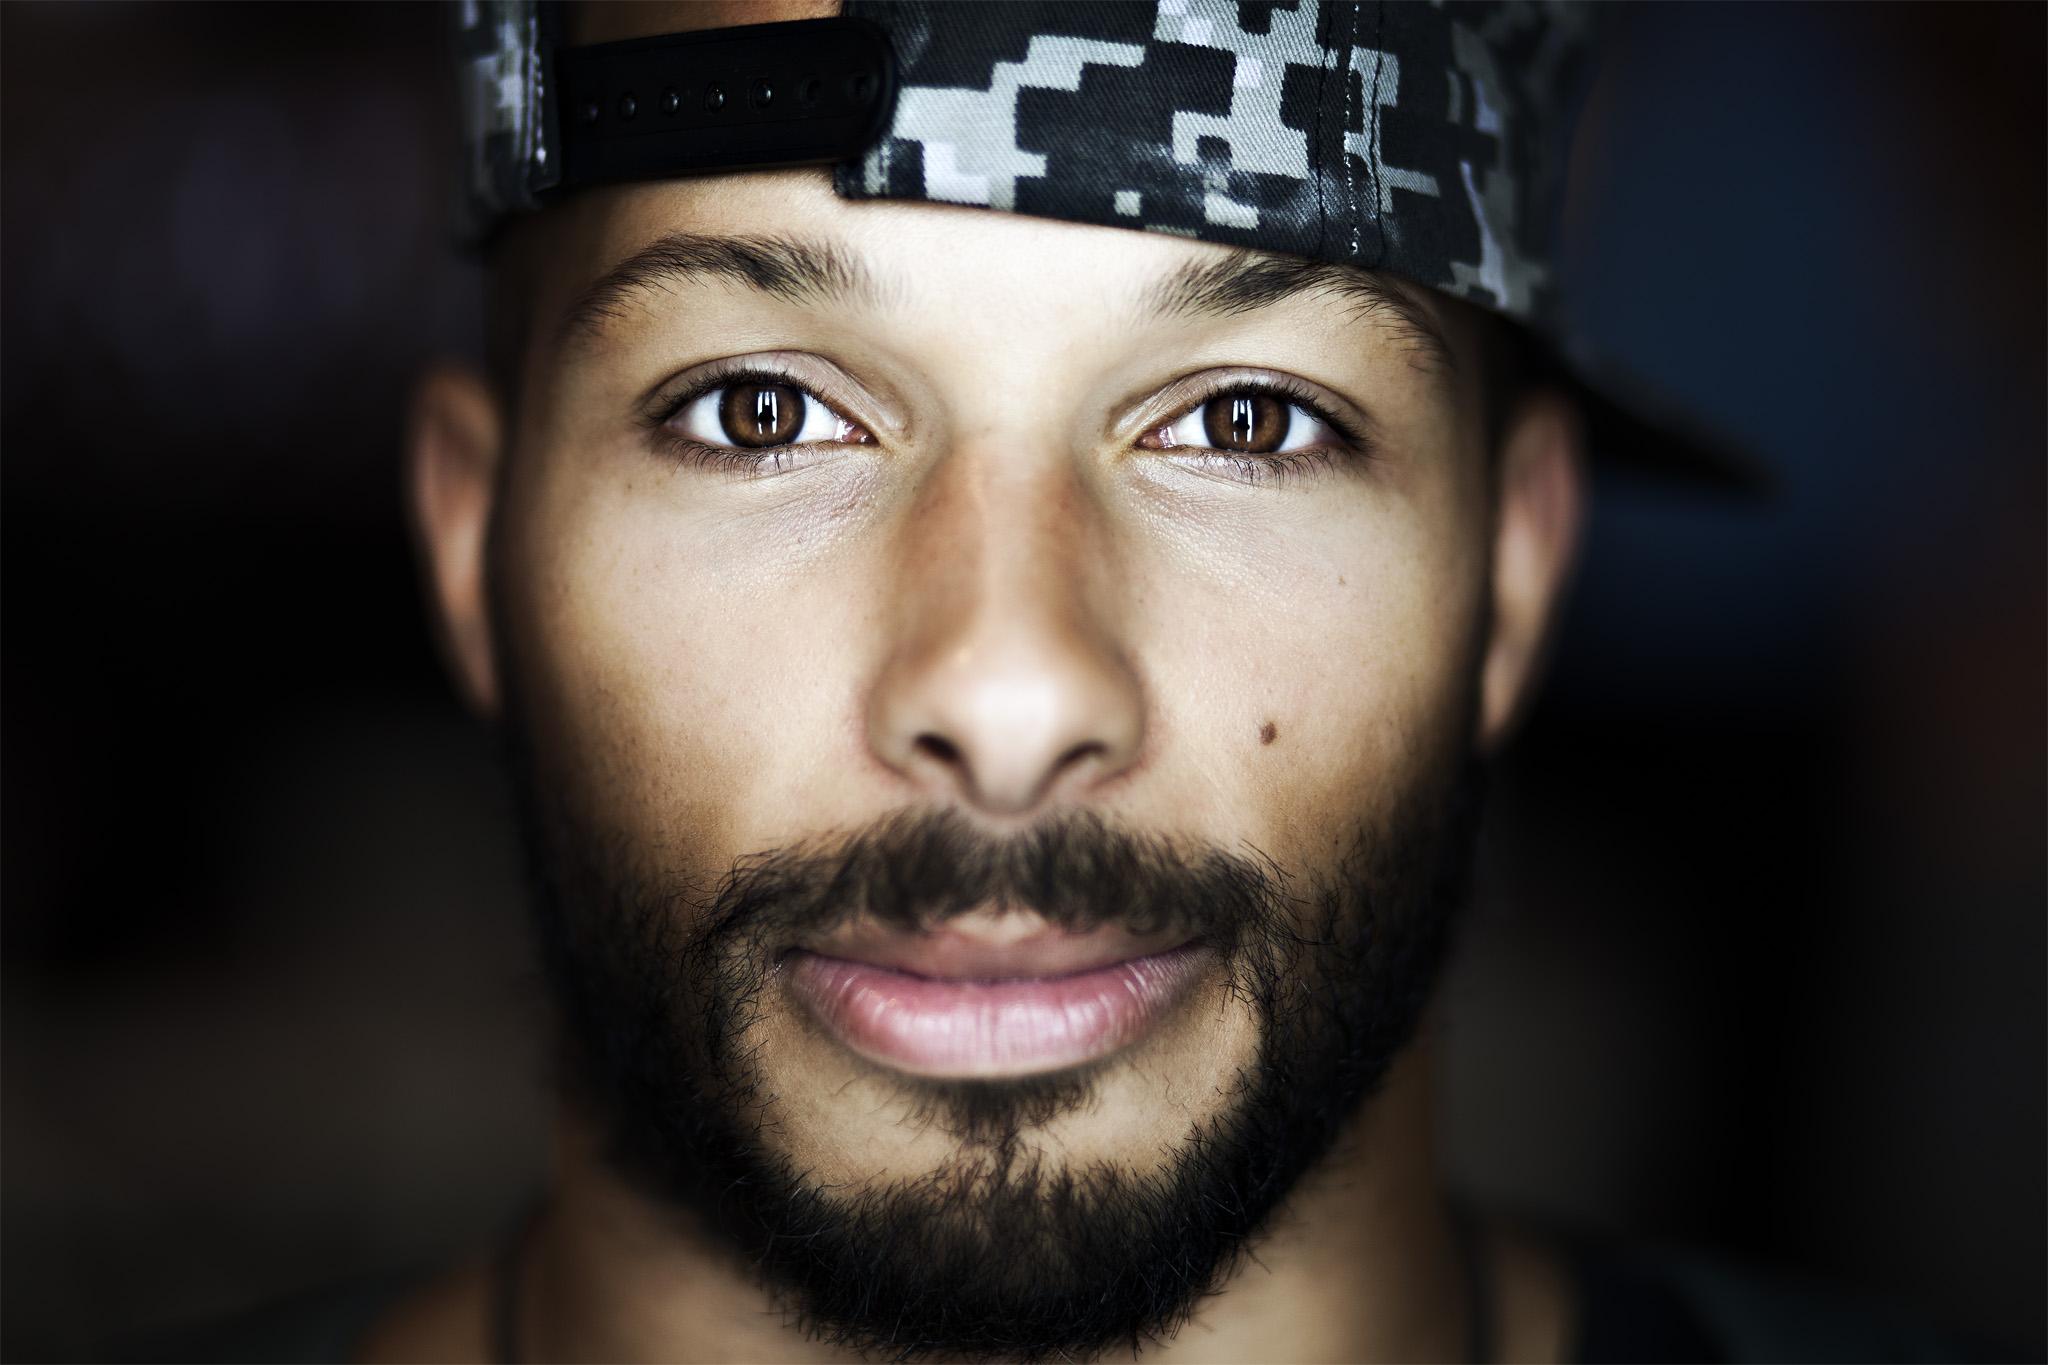 Kareem-Portrait-Headshot-Sydney.jpg